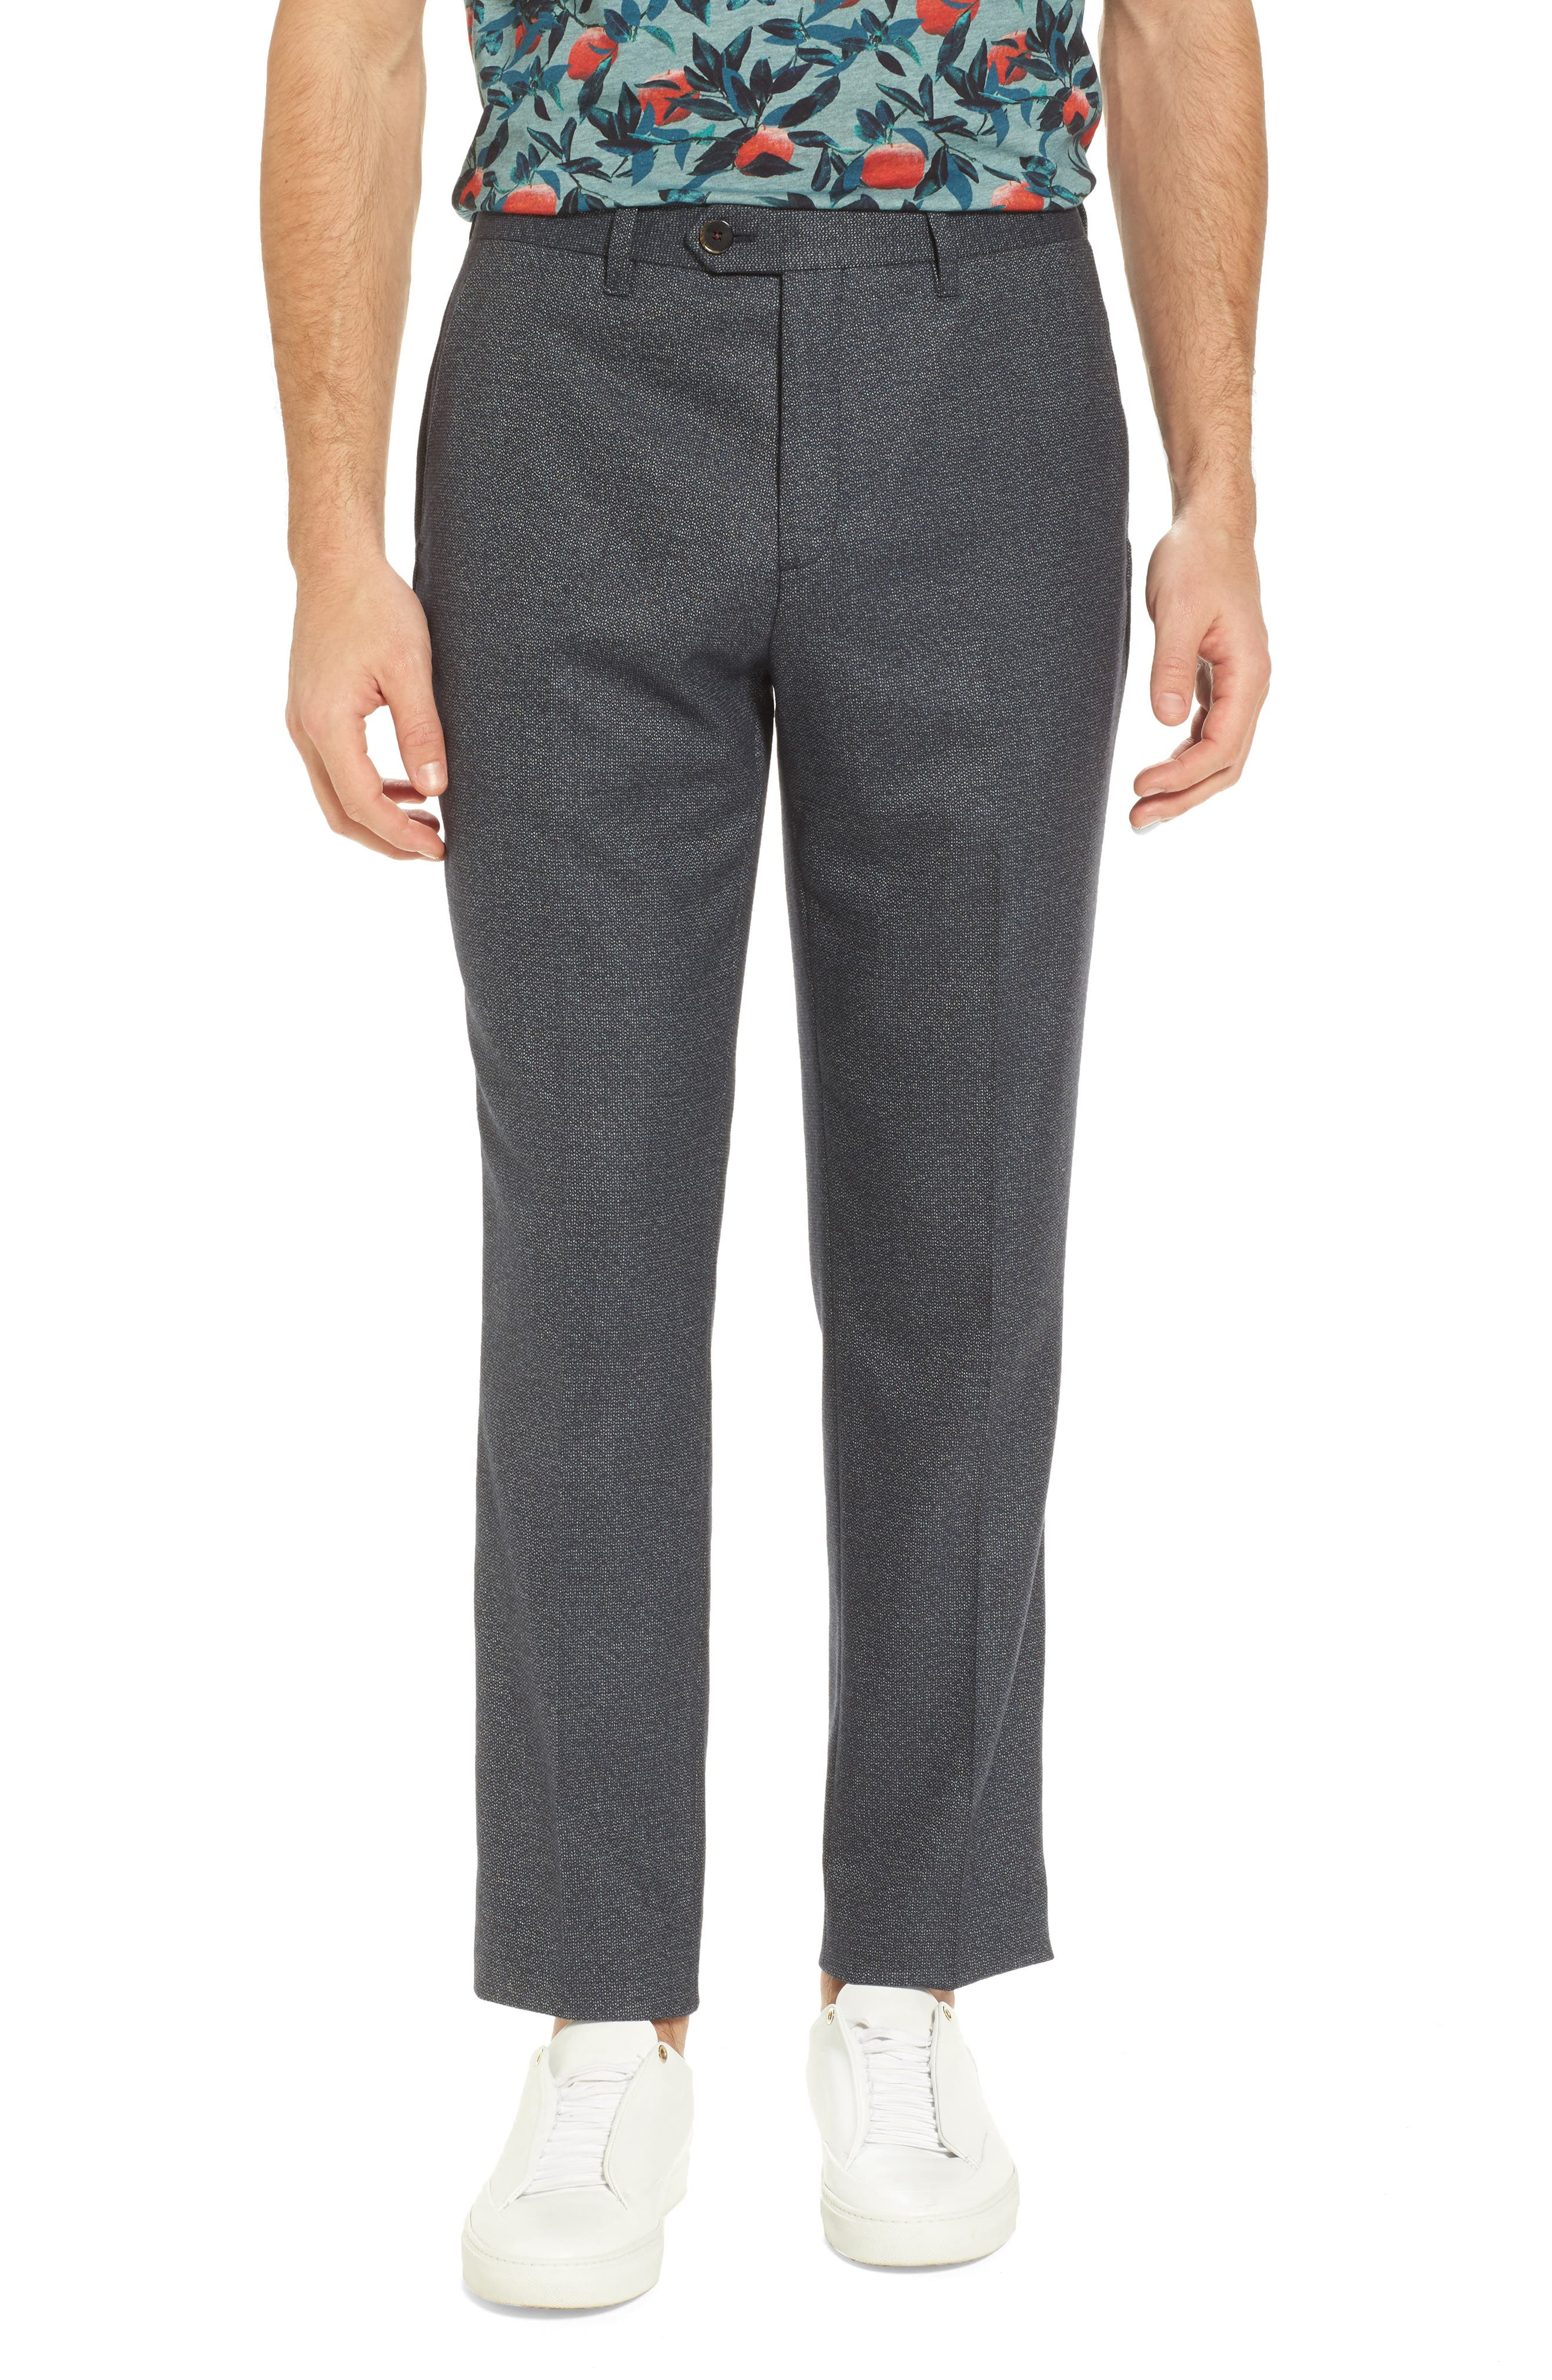 Beektro Trim Fit Trousers,                             Main thumbnail 1, color,